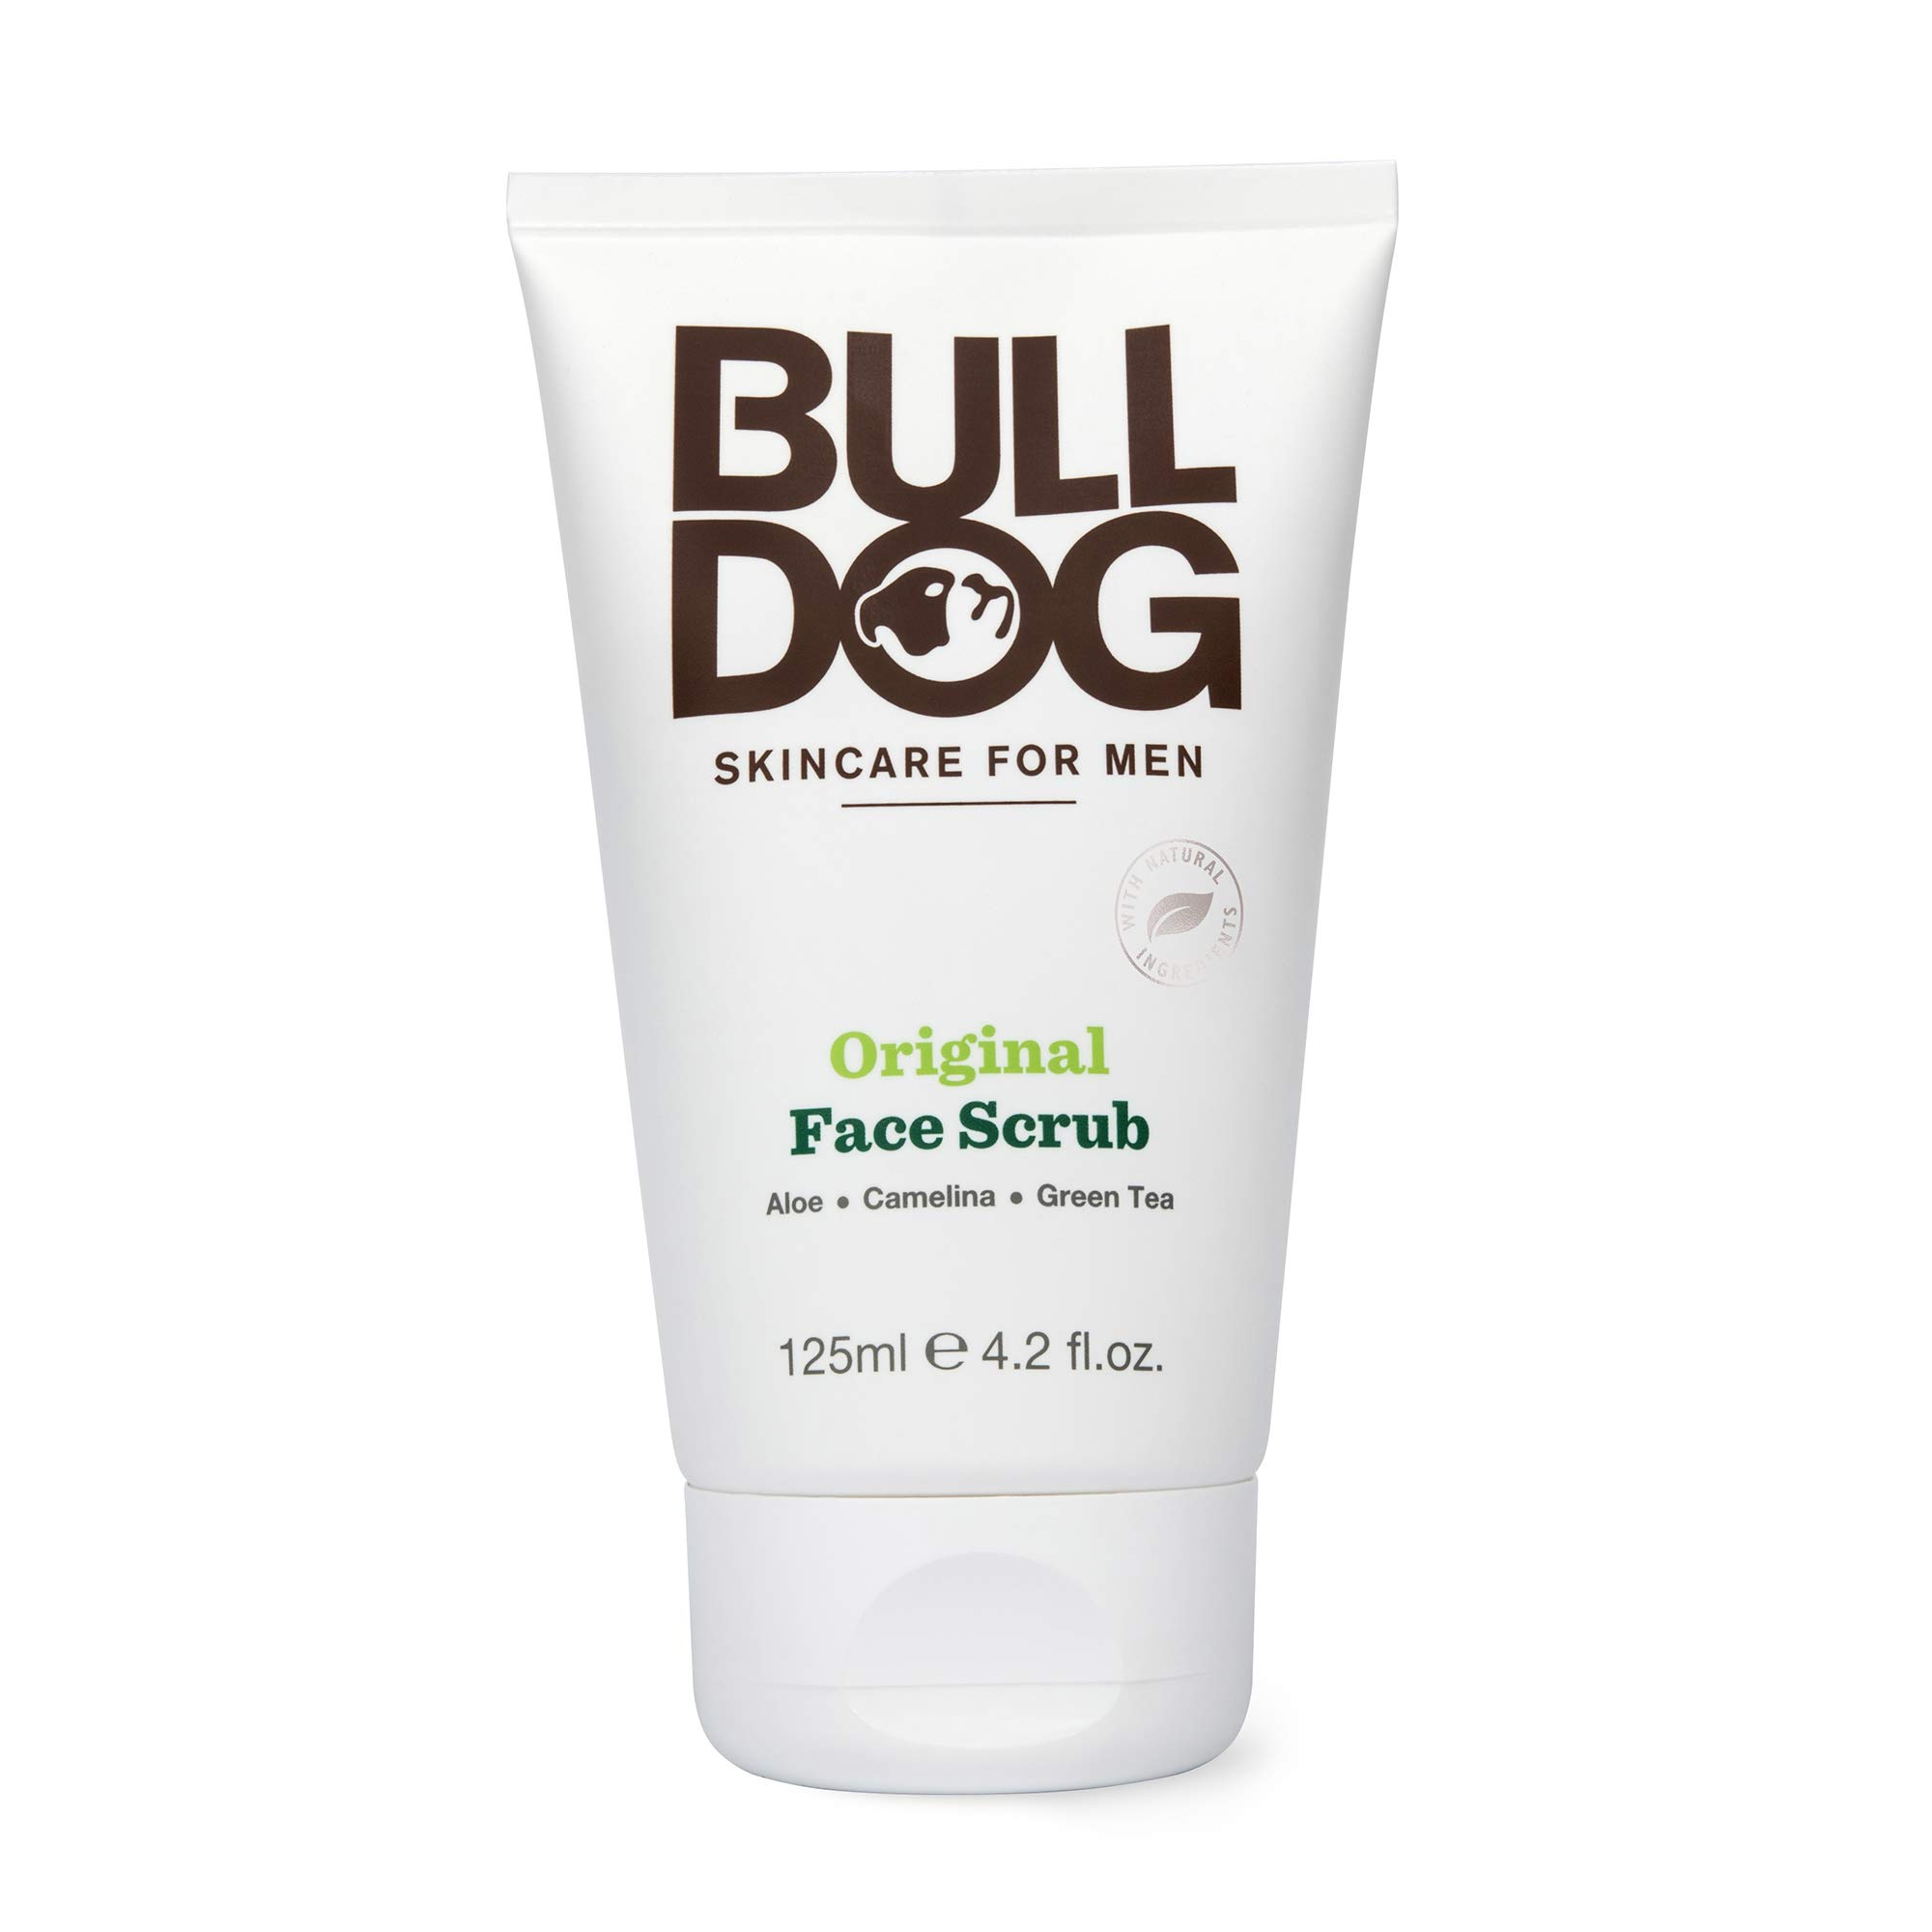 Bulldog Skincare and Grooming For Men Original Face Scrub, 4.2 Ounce